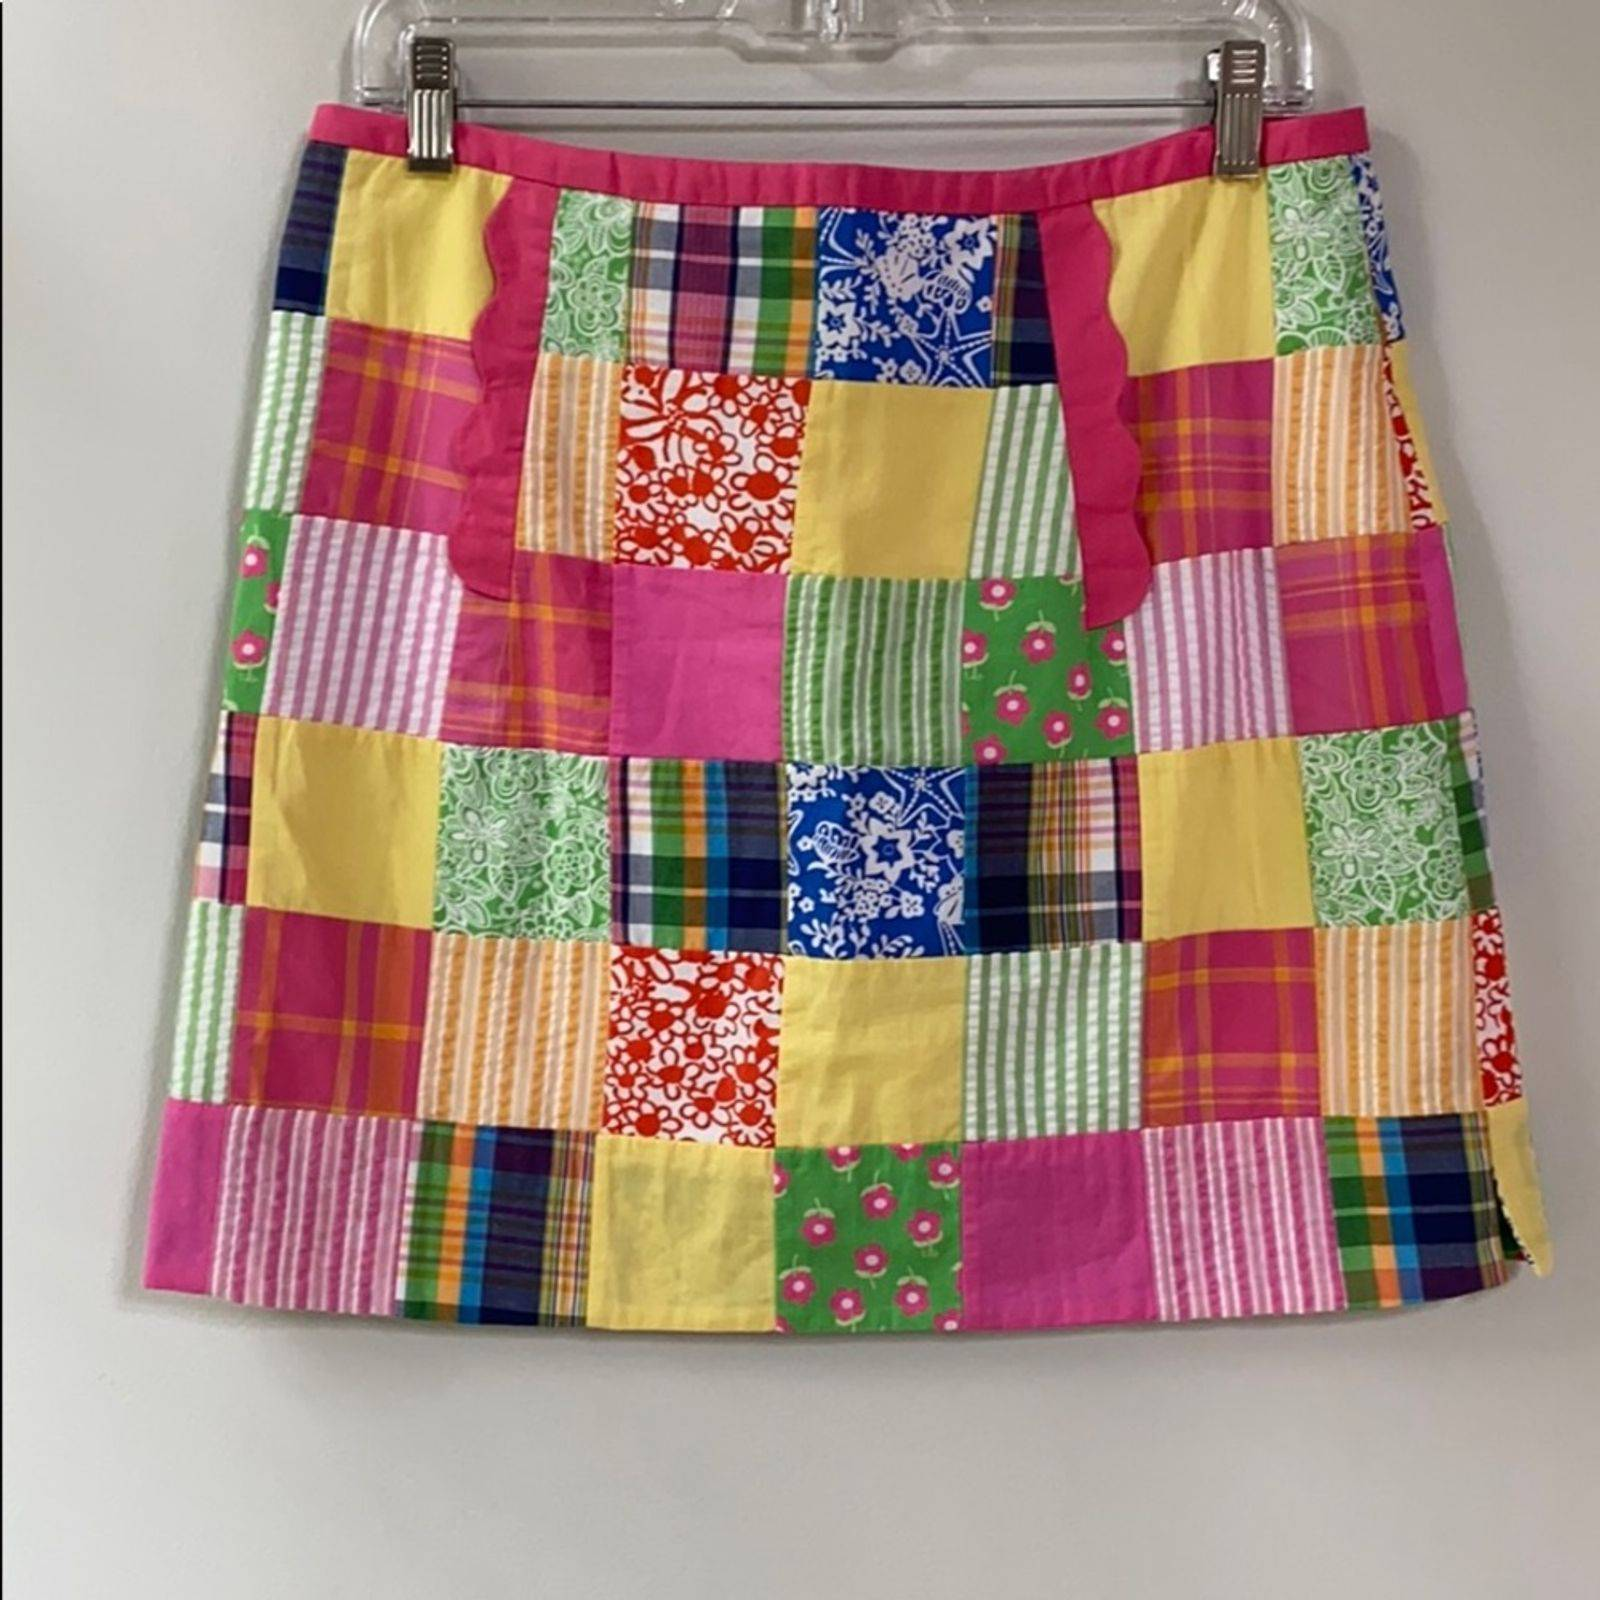 VTG Lilly Pulitzer Patchwork Skirt